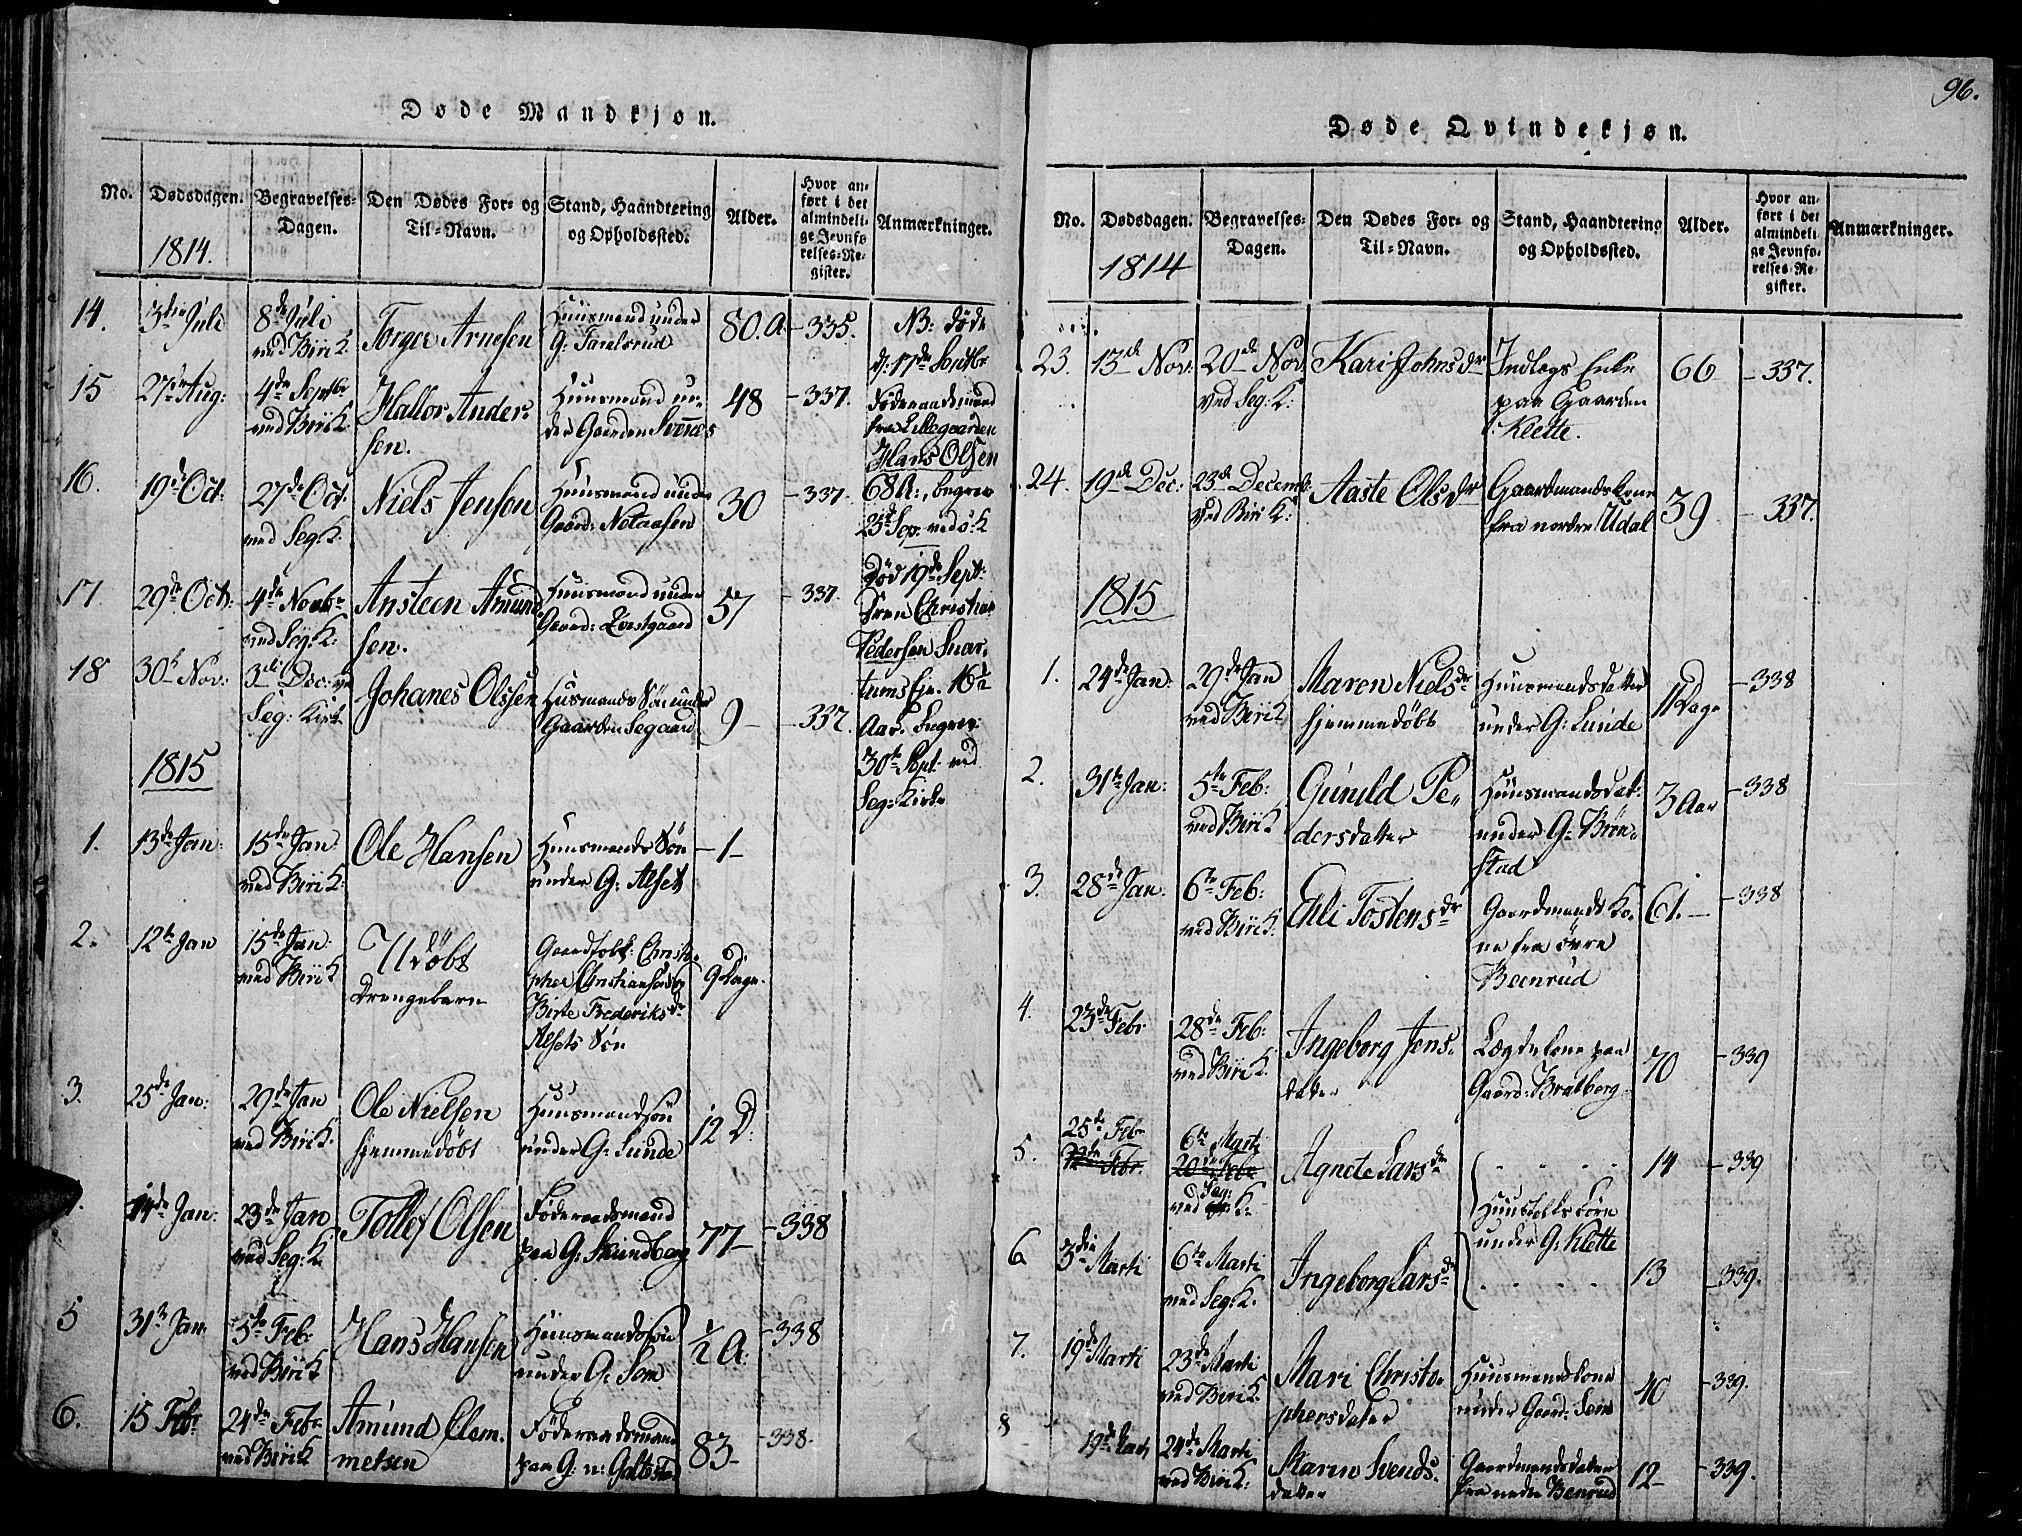 SAH, Biri prestekontor, Ministerialbok nr. 3, 1814-1828, s. 96